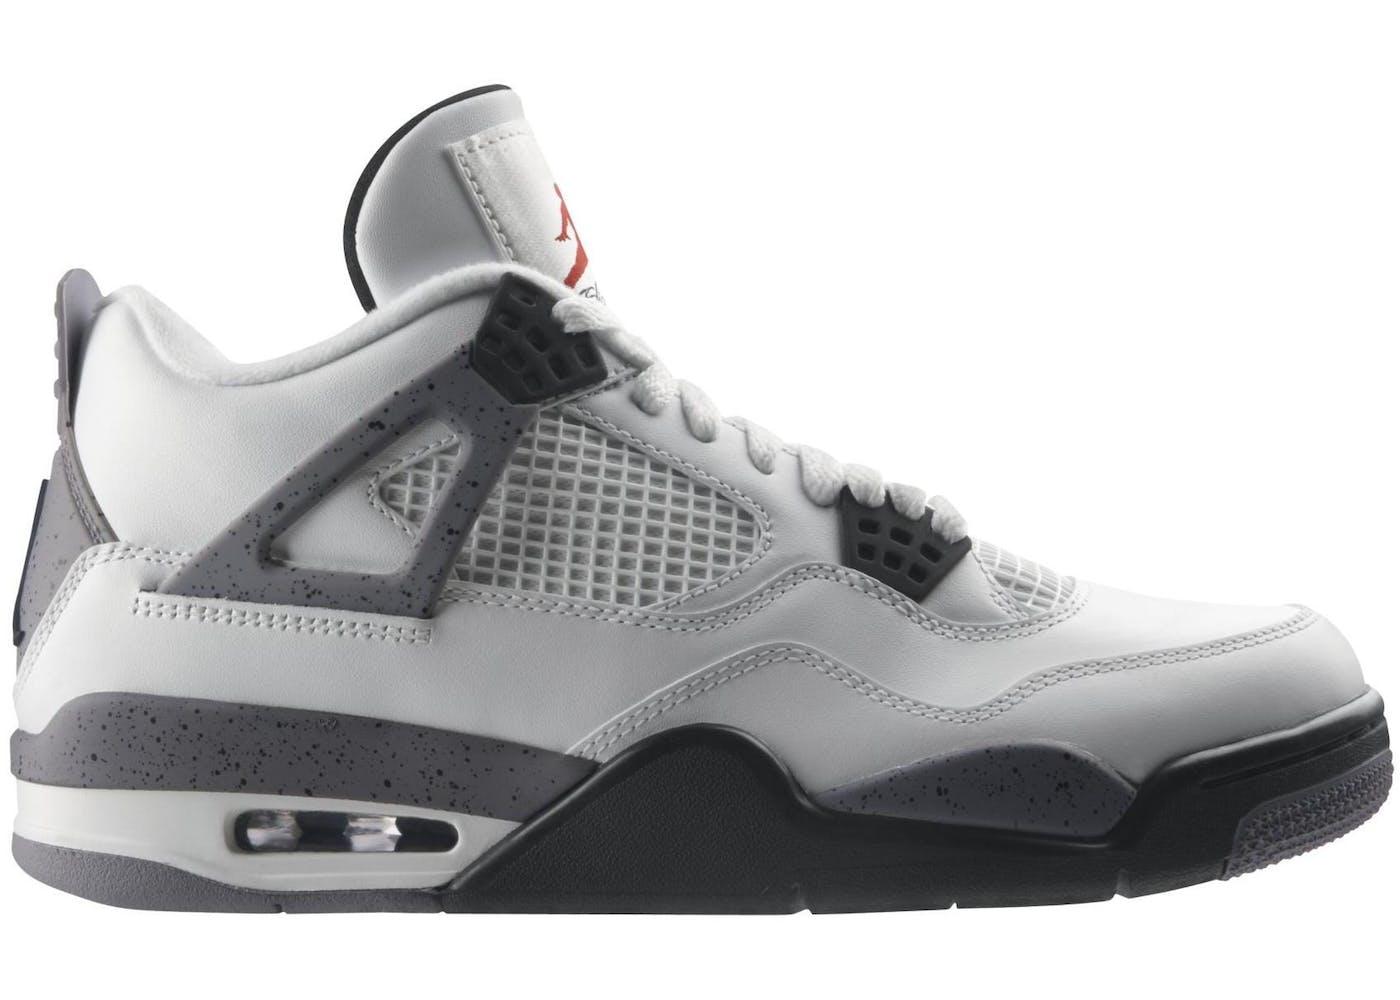 on sale 3bba9 2f979 ... Jordan 4 Retro White Cement (2012) ...